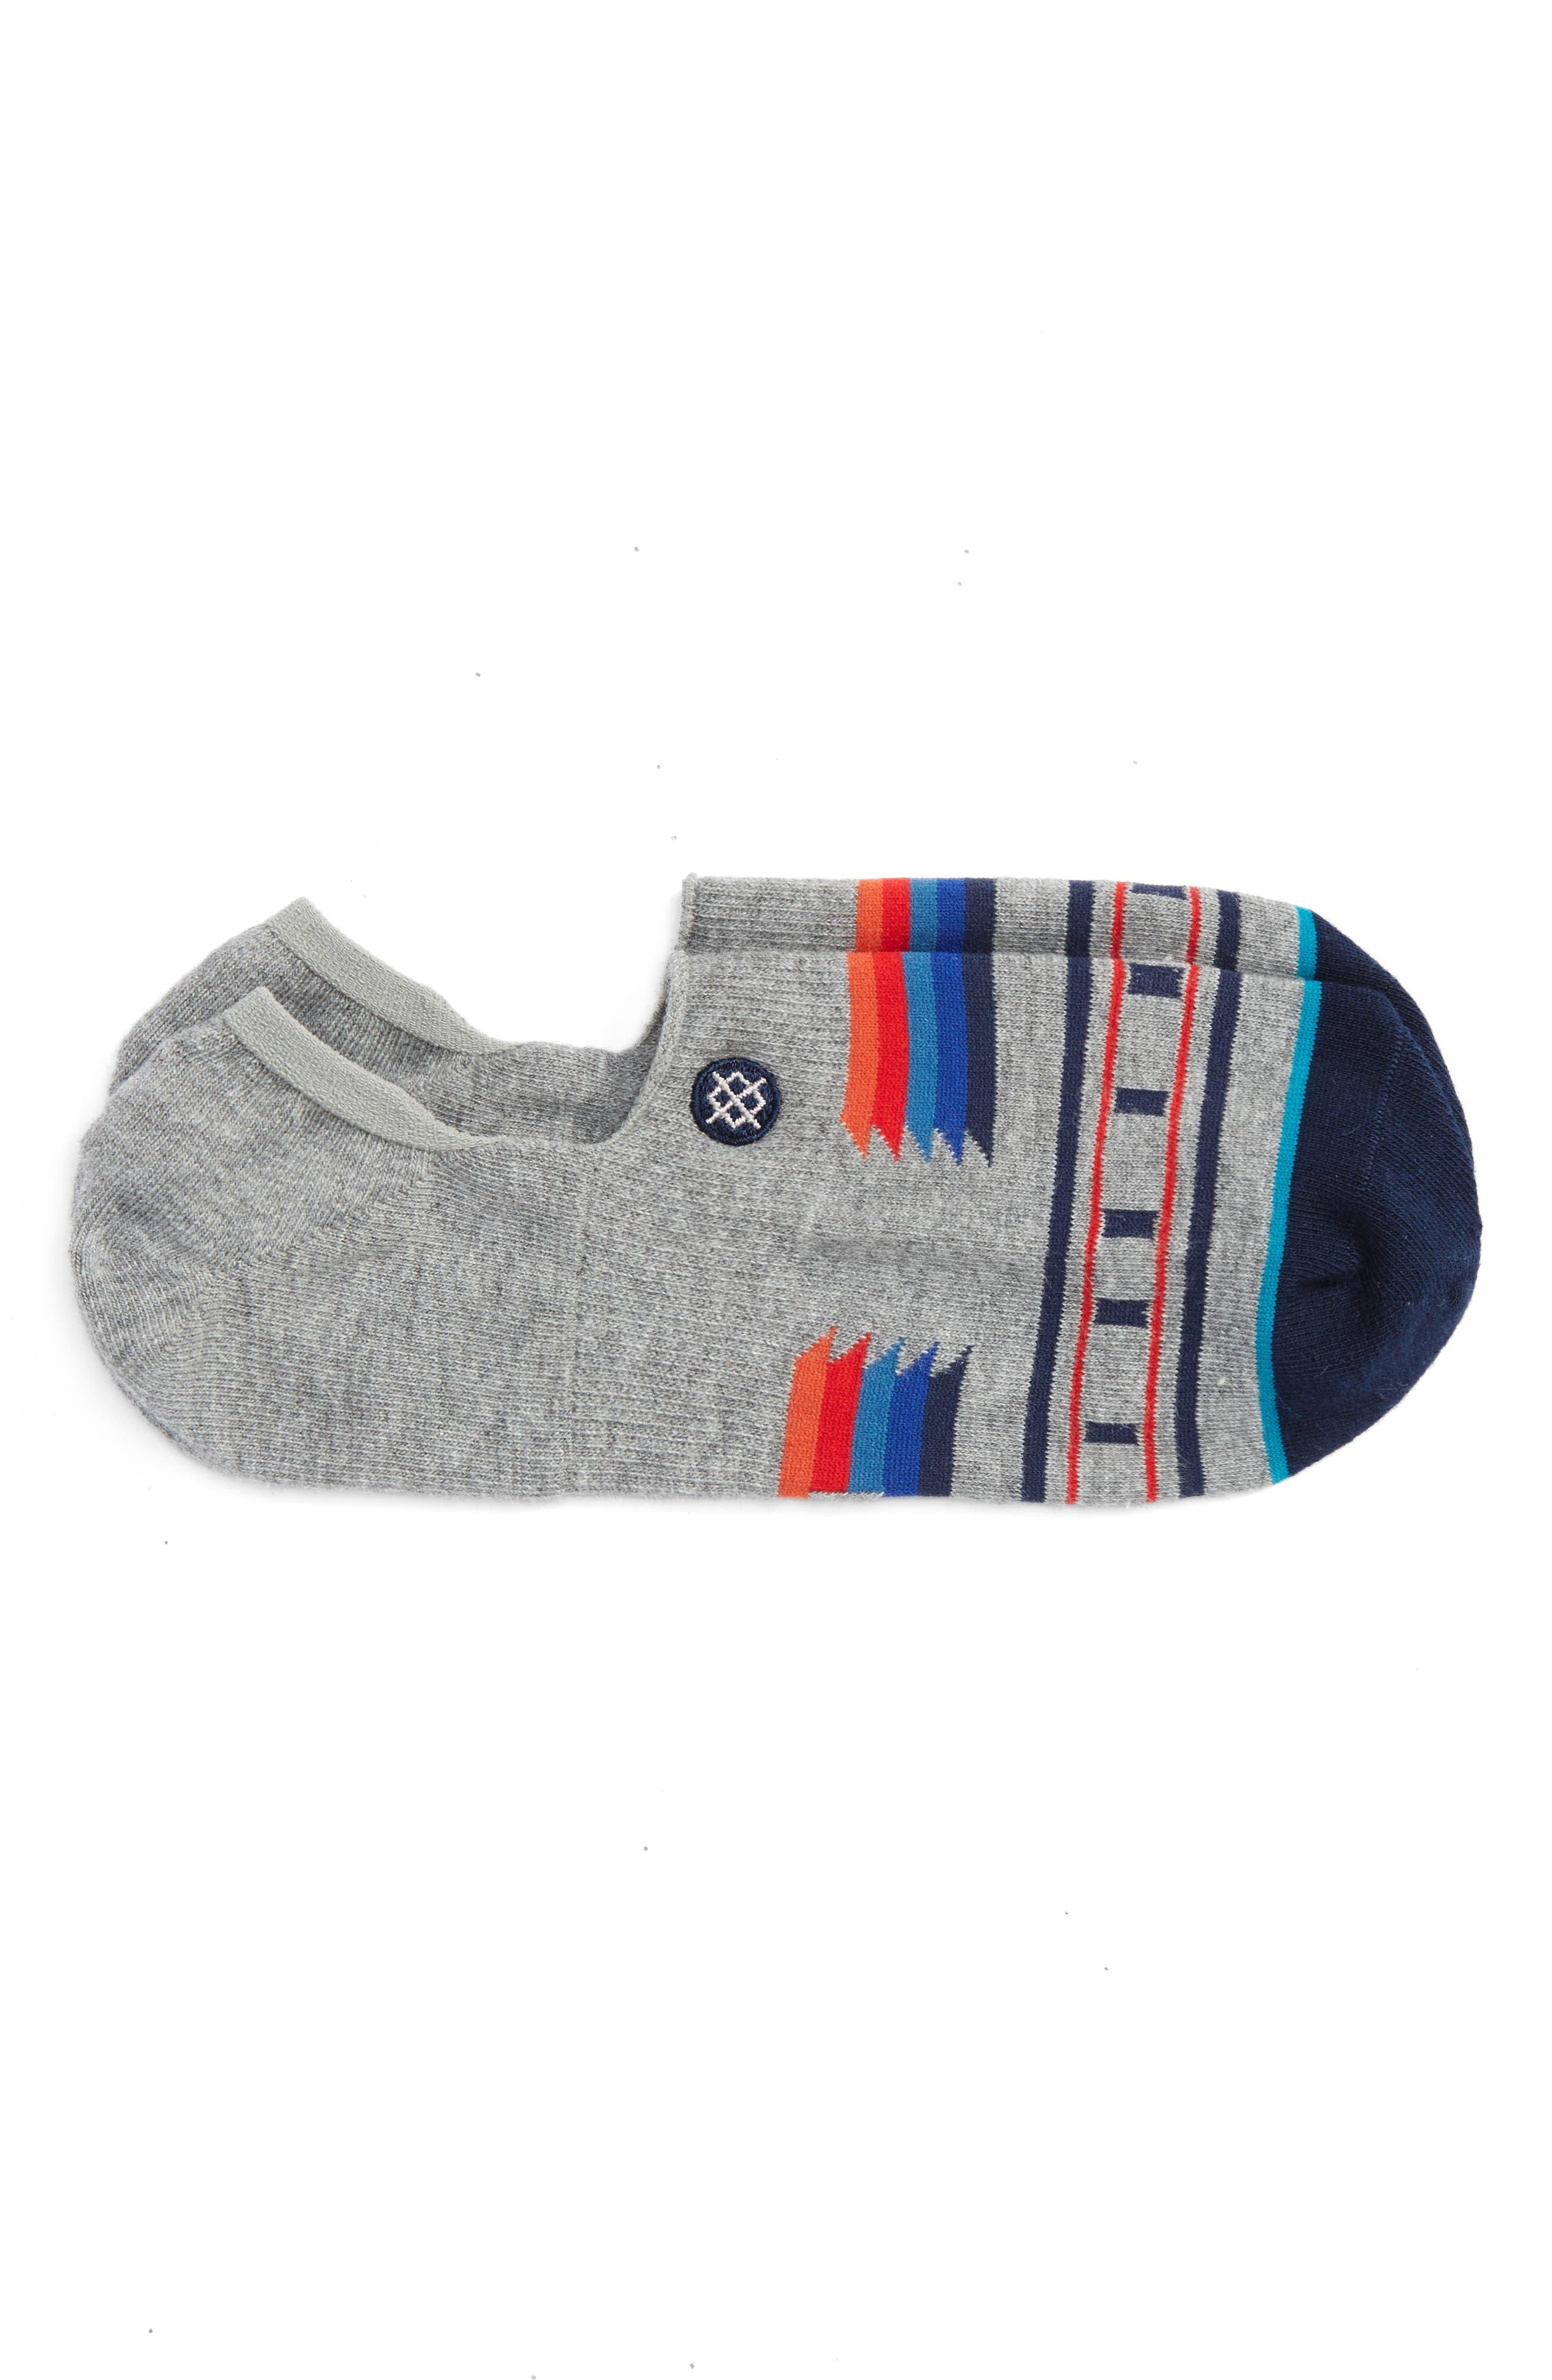 Alum No-Show Socks,                         Main,                         color, Grey